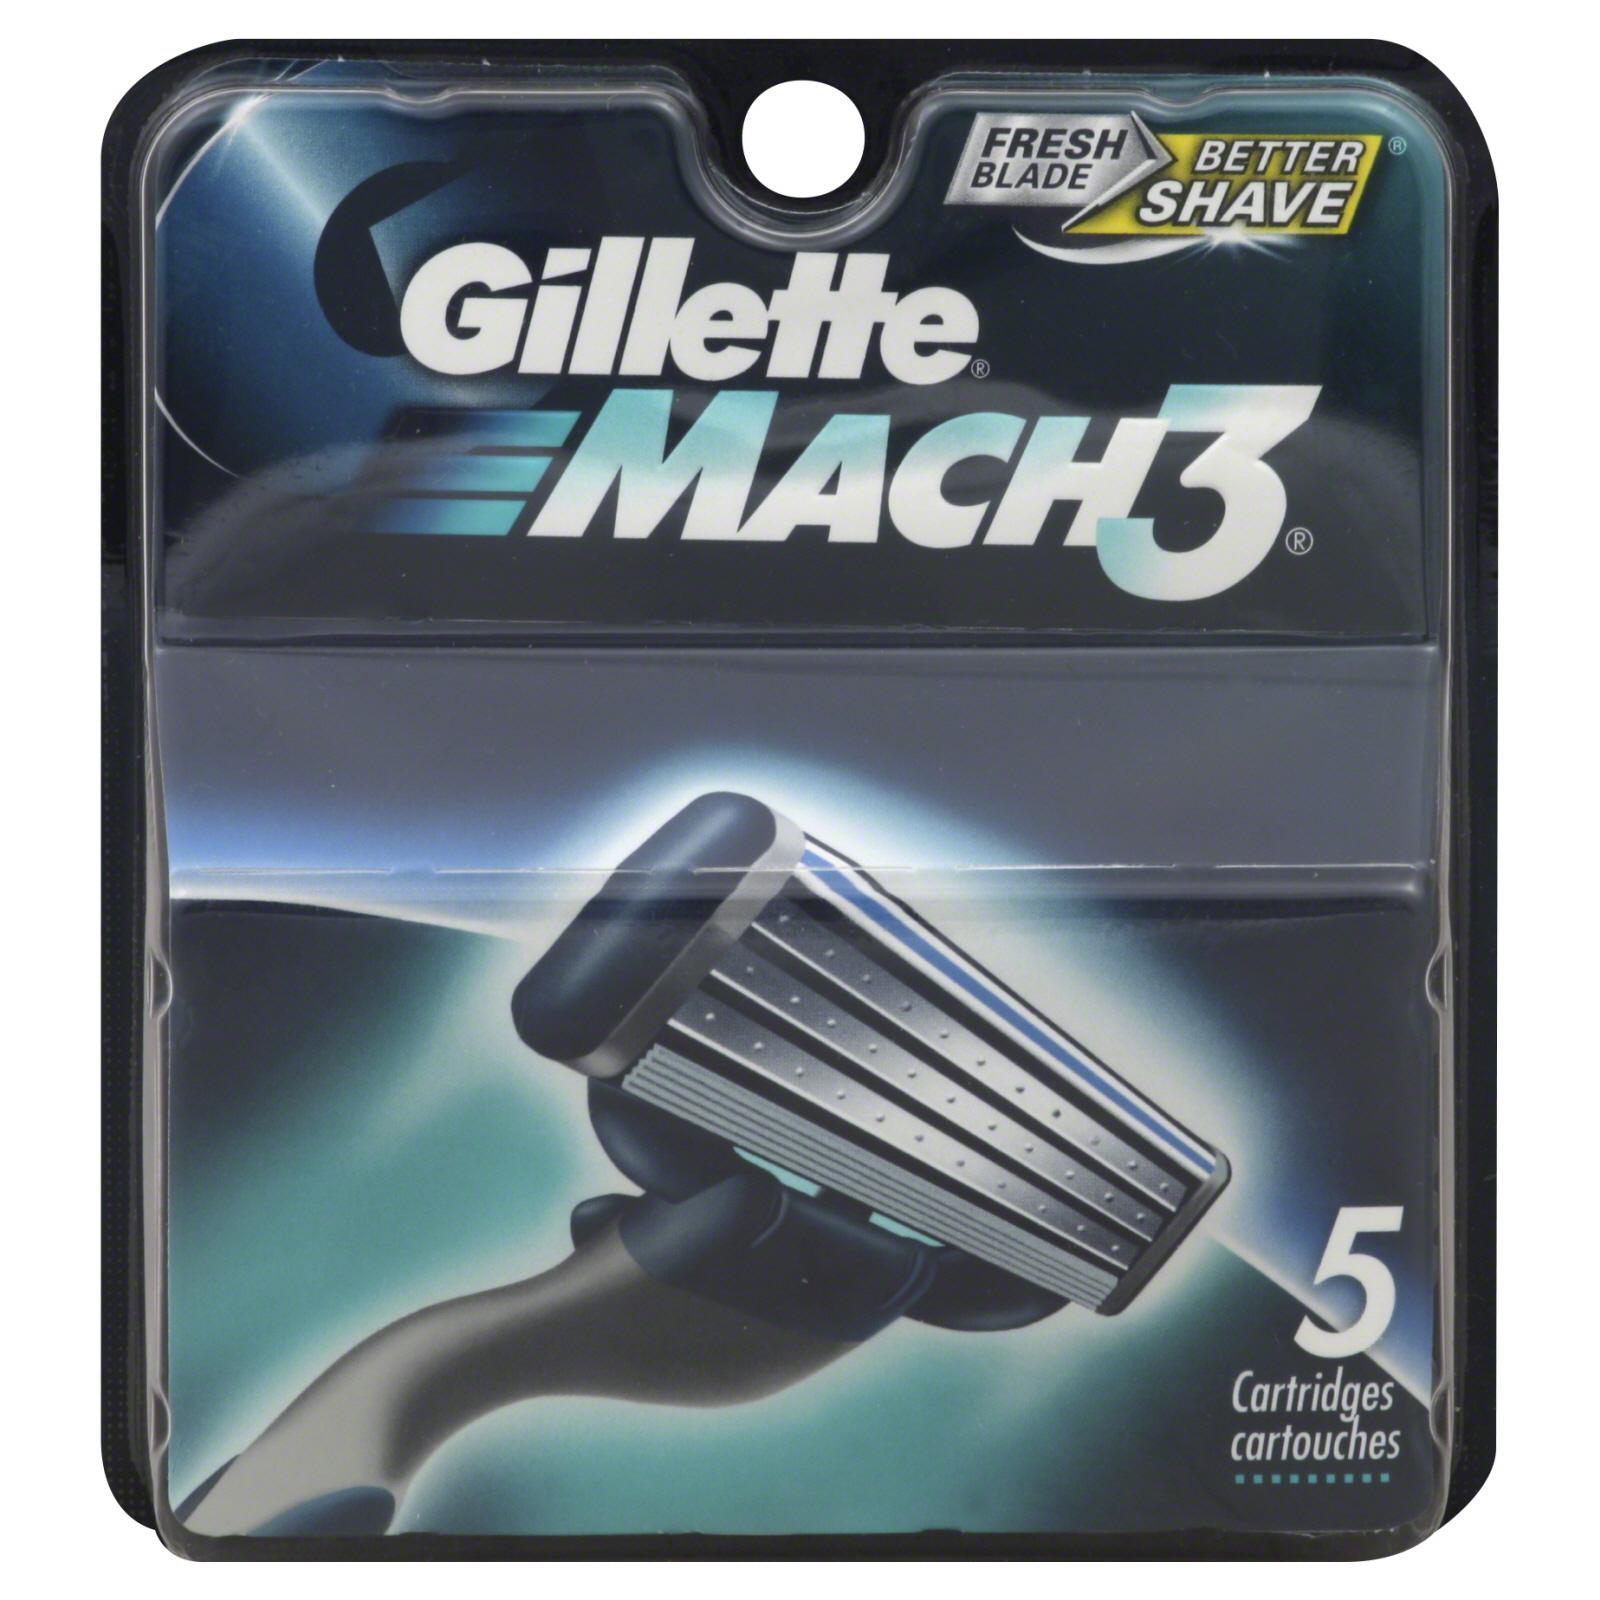 Amazon: Gillette Razor Refills: 15-Ct Mach3 $16.99